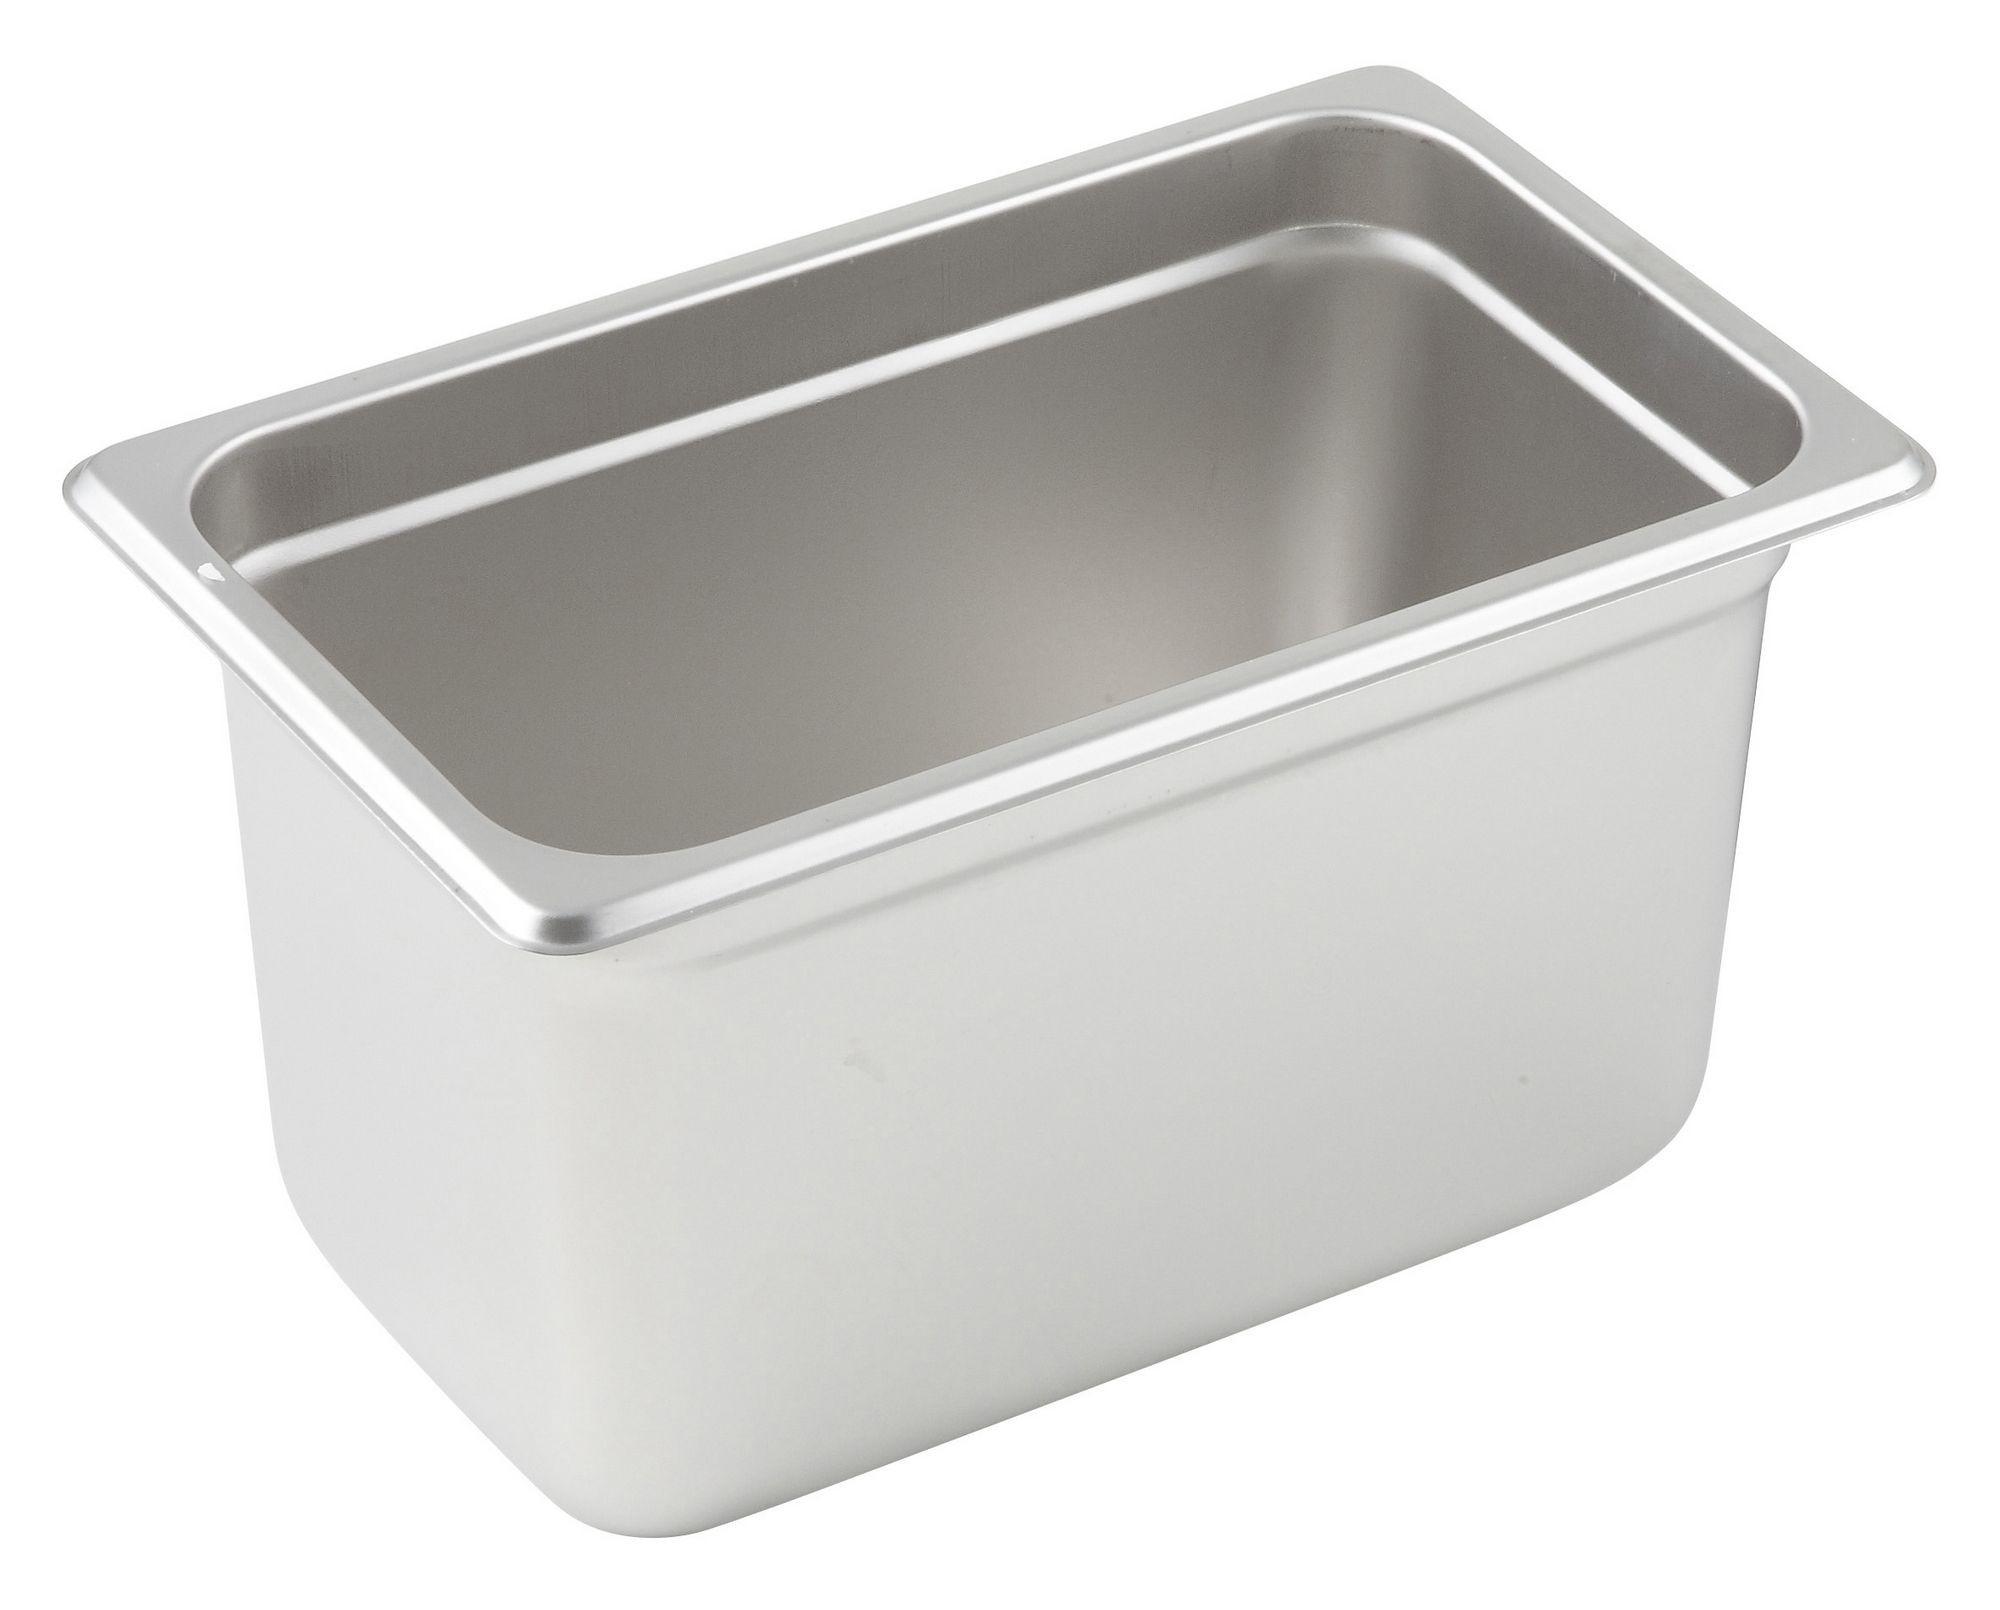 "Winco SPJL-406 1/4 Size Anti-Jam 25 Gauge Steam Table Pan 6"" Deep"